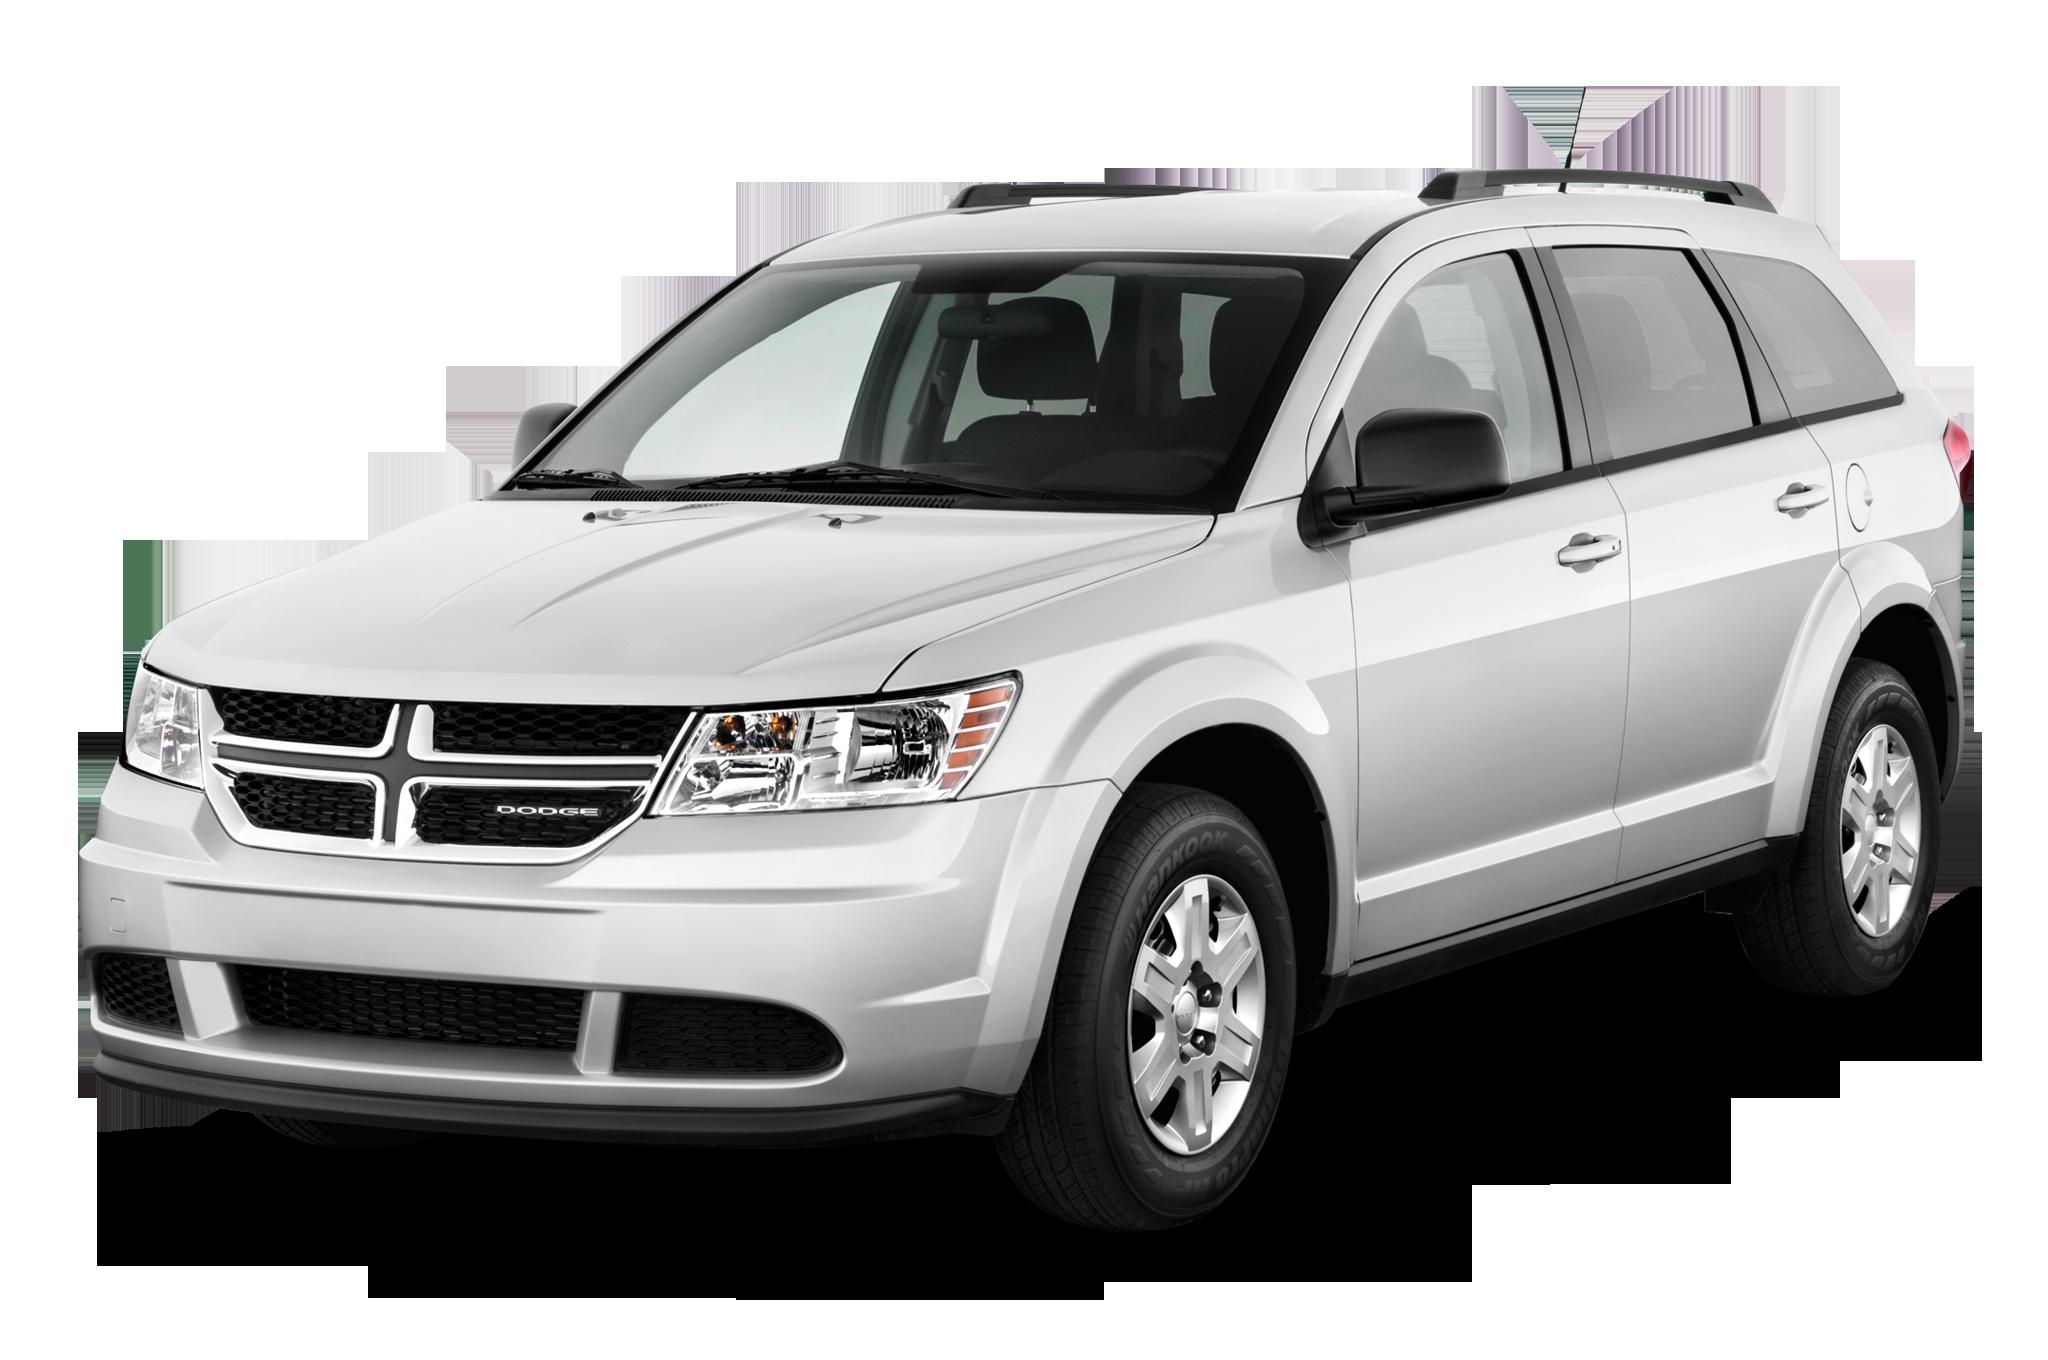 2016 Dodge Journey Overview